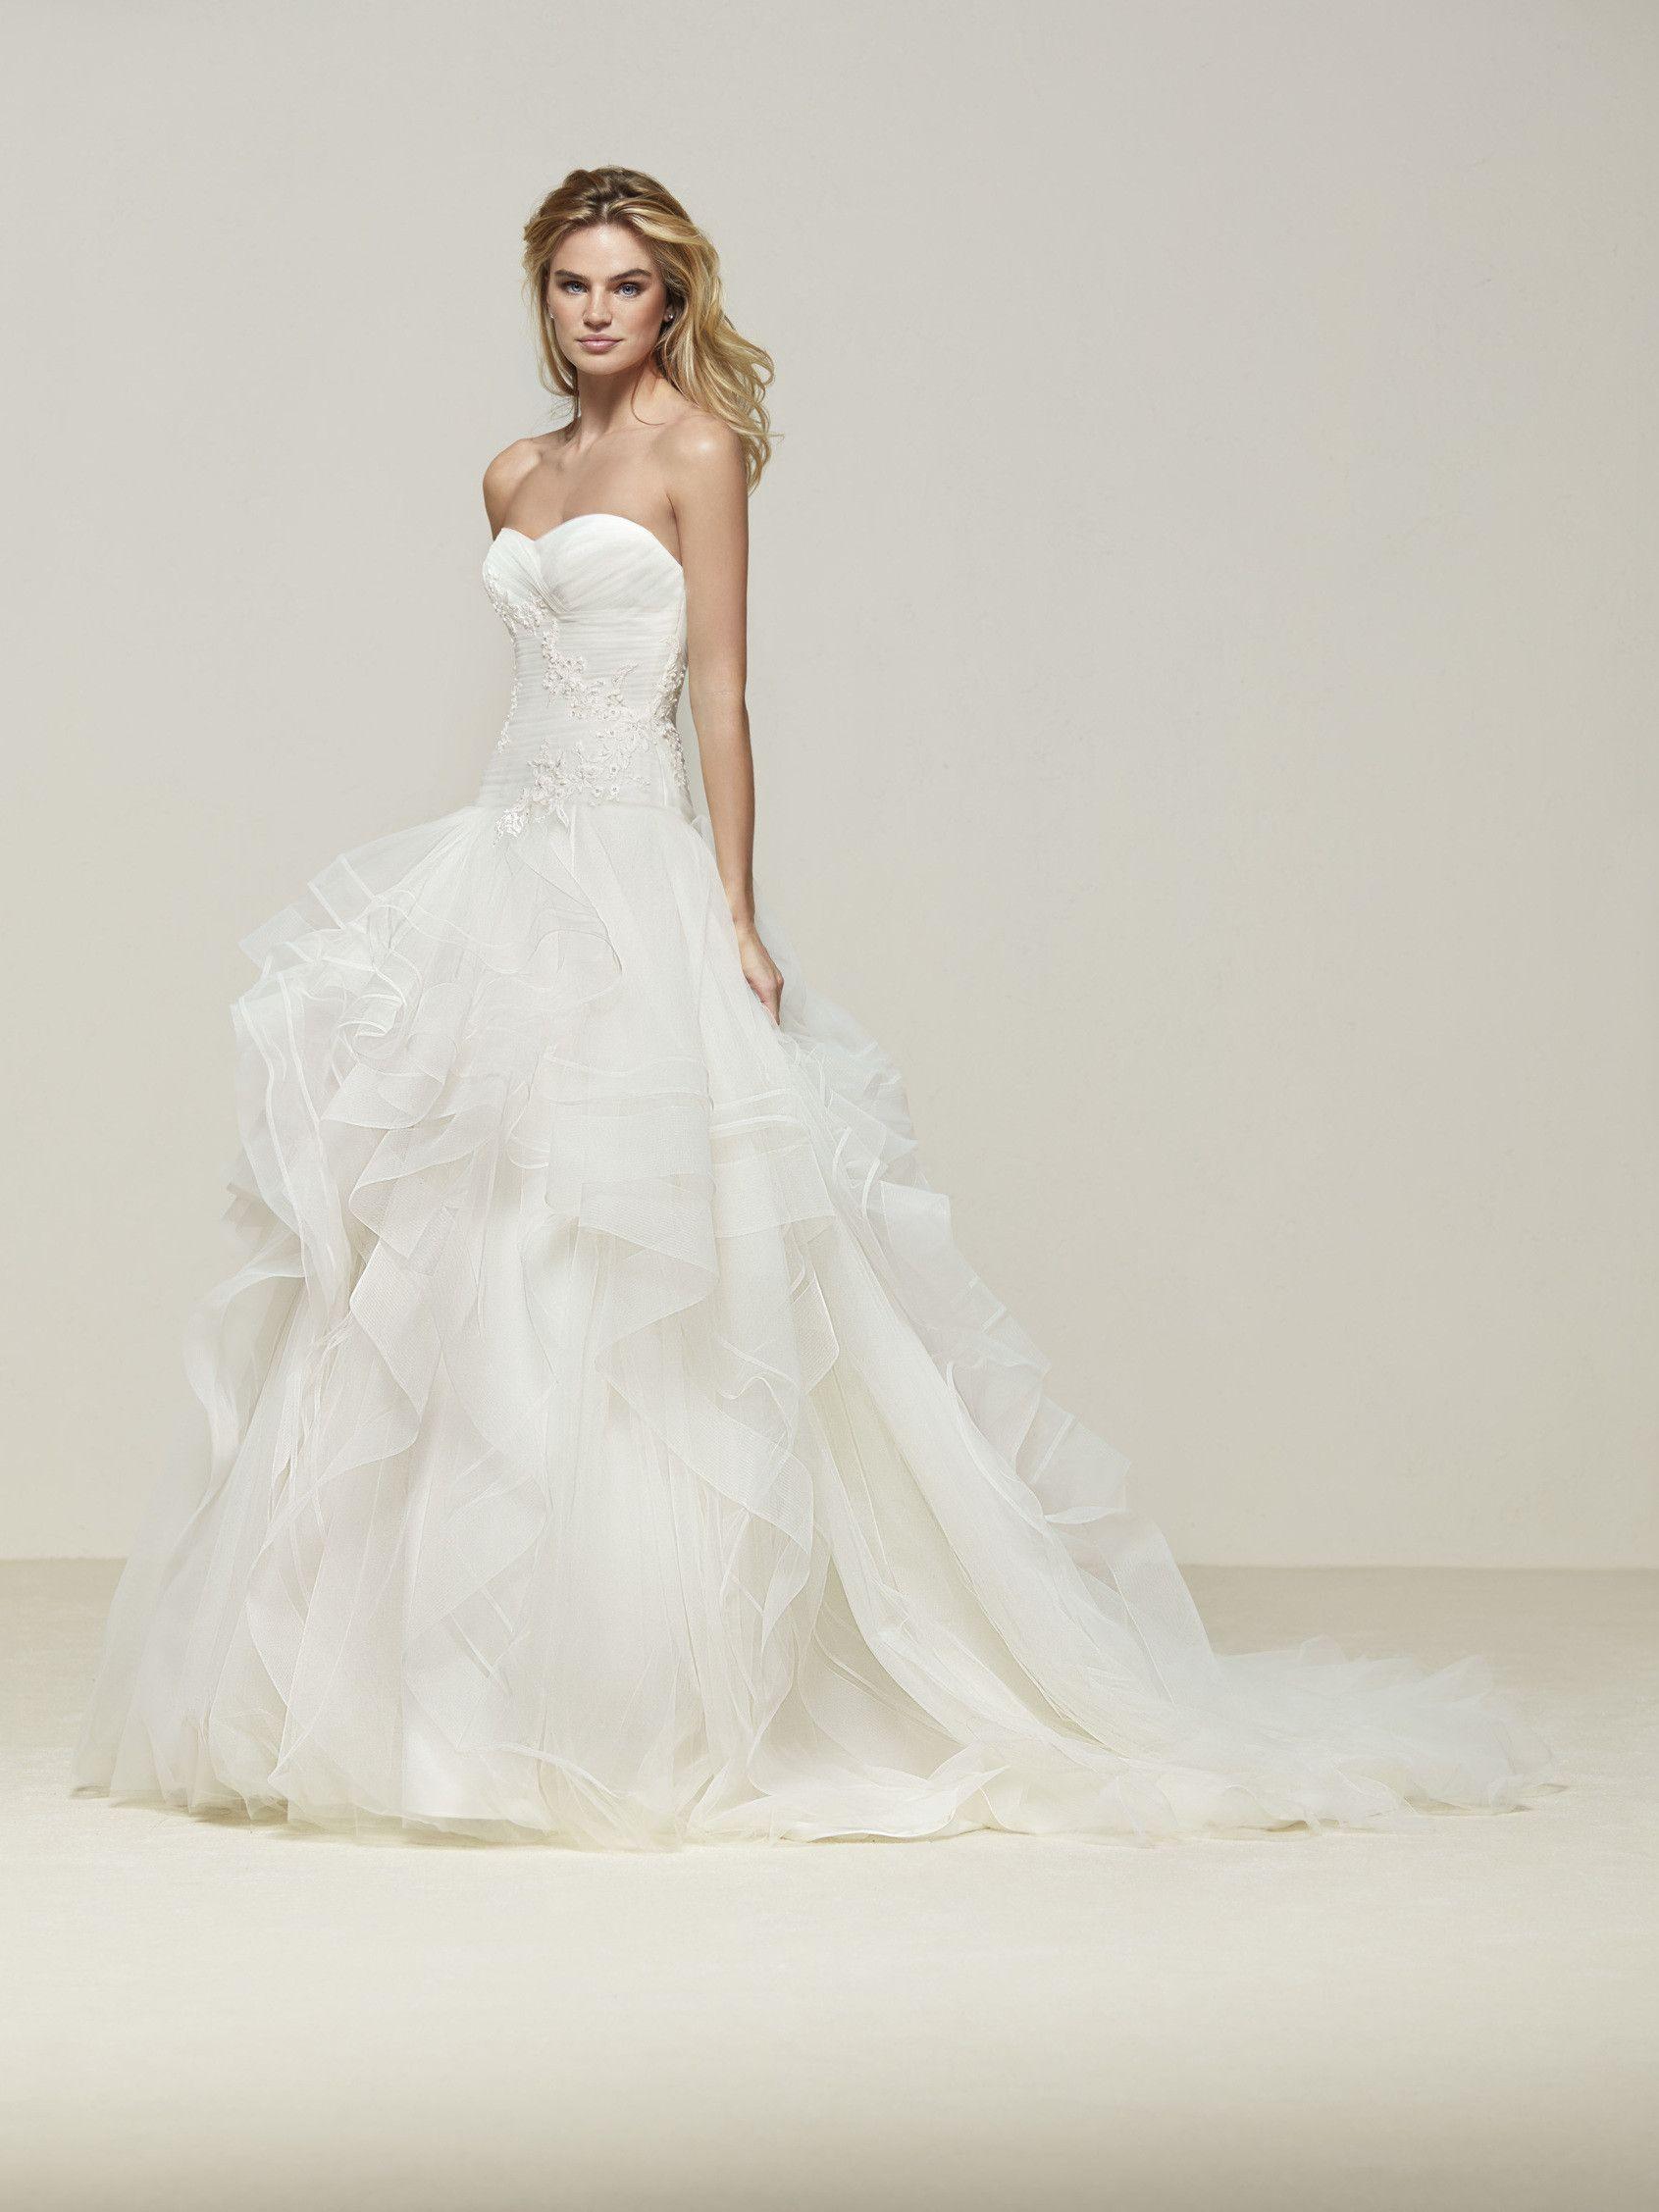 Dazzling princess style wedding dress - Draliana - Pronovias ...